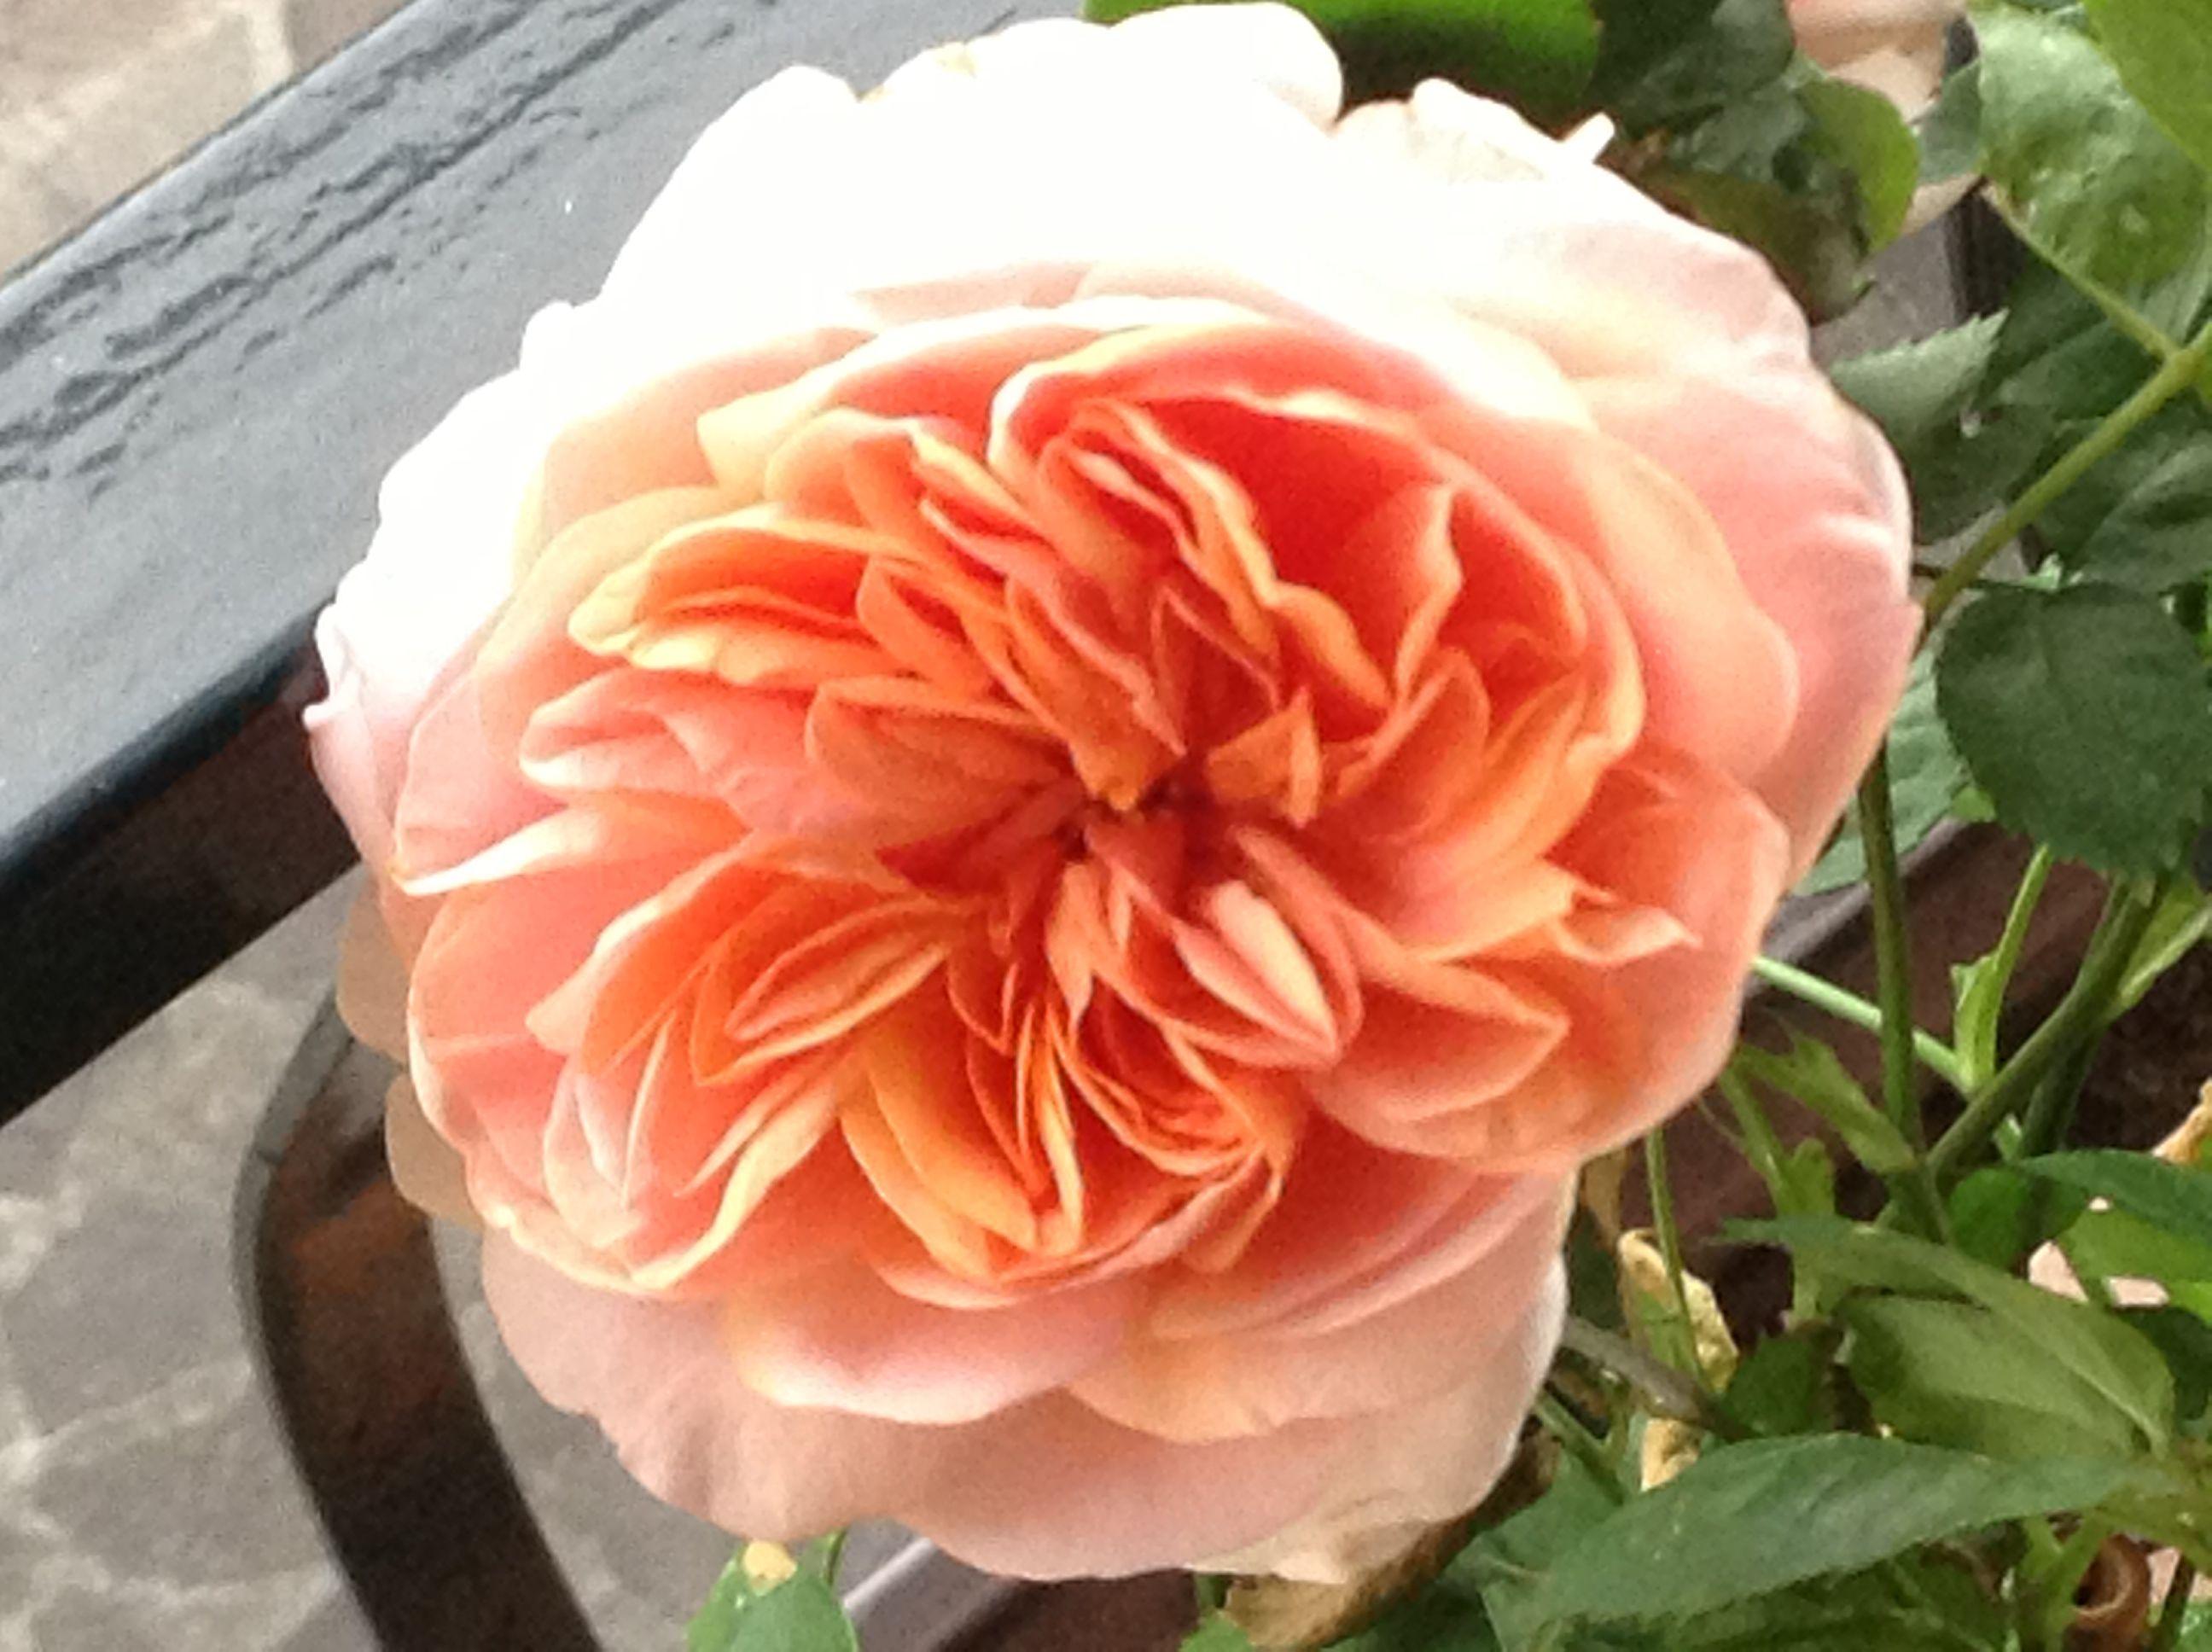 My peach rose | I love flowers,their shape,their Colors,their smell ...